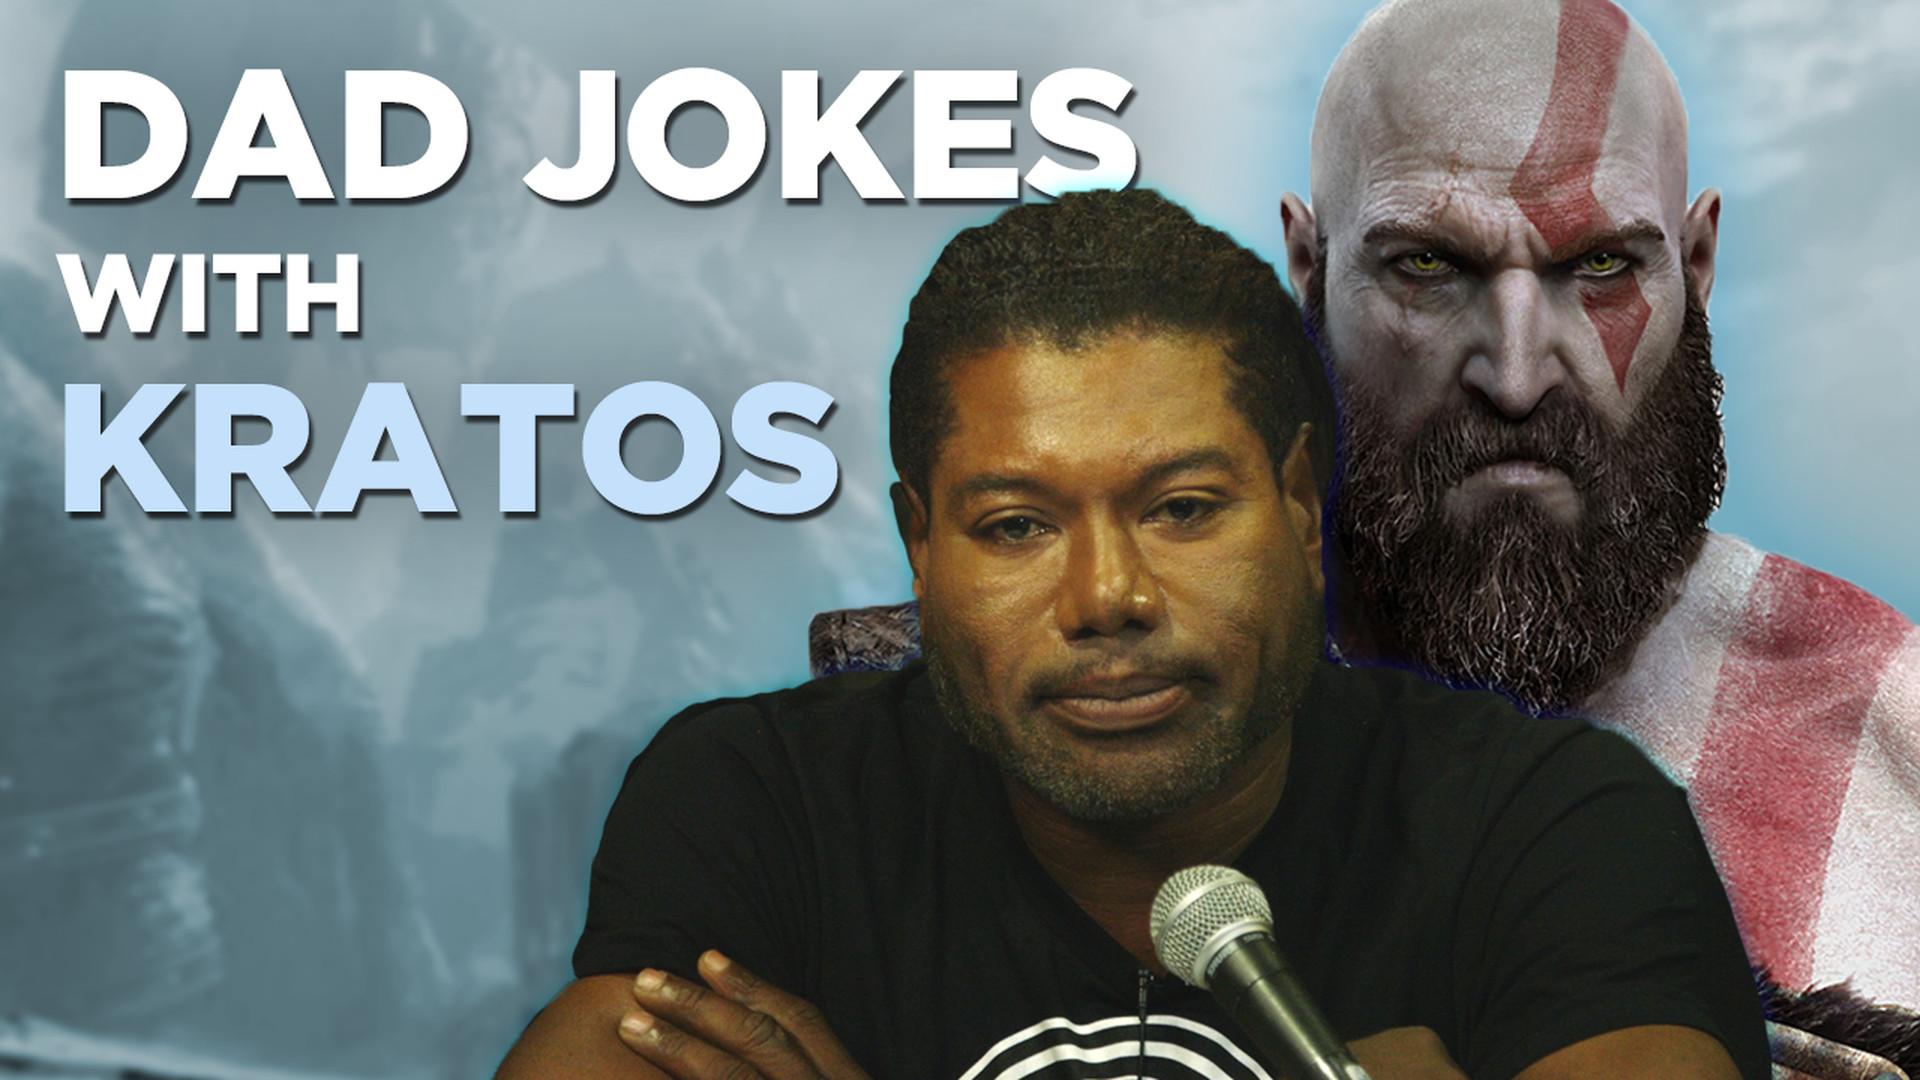 Watch God of War's voice of Kratos tell some bad dad jokes